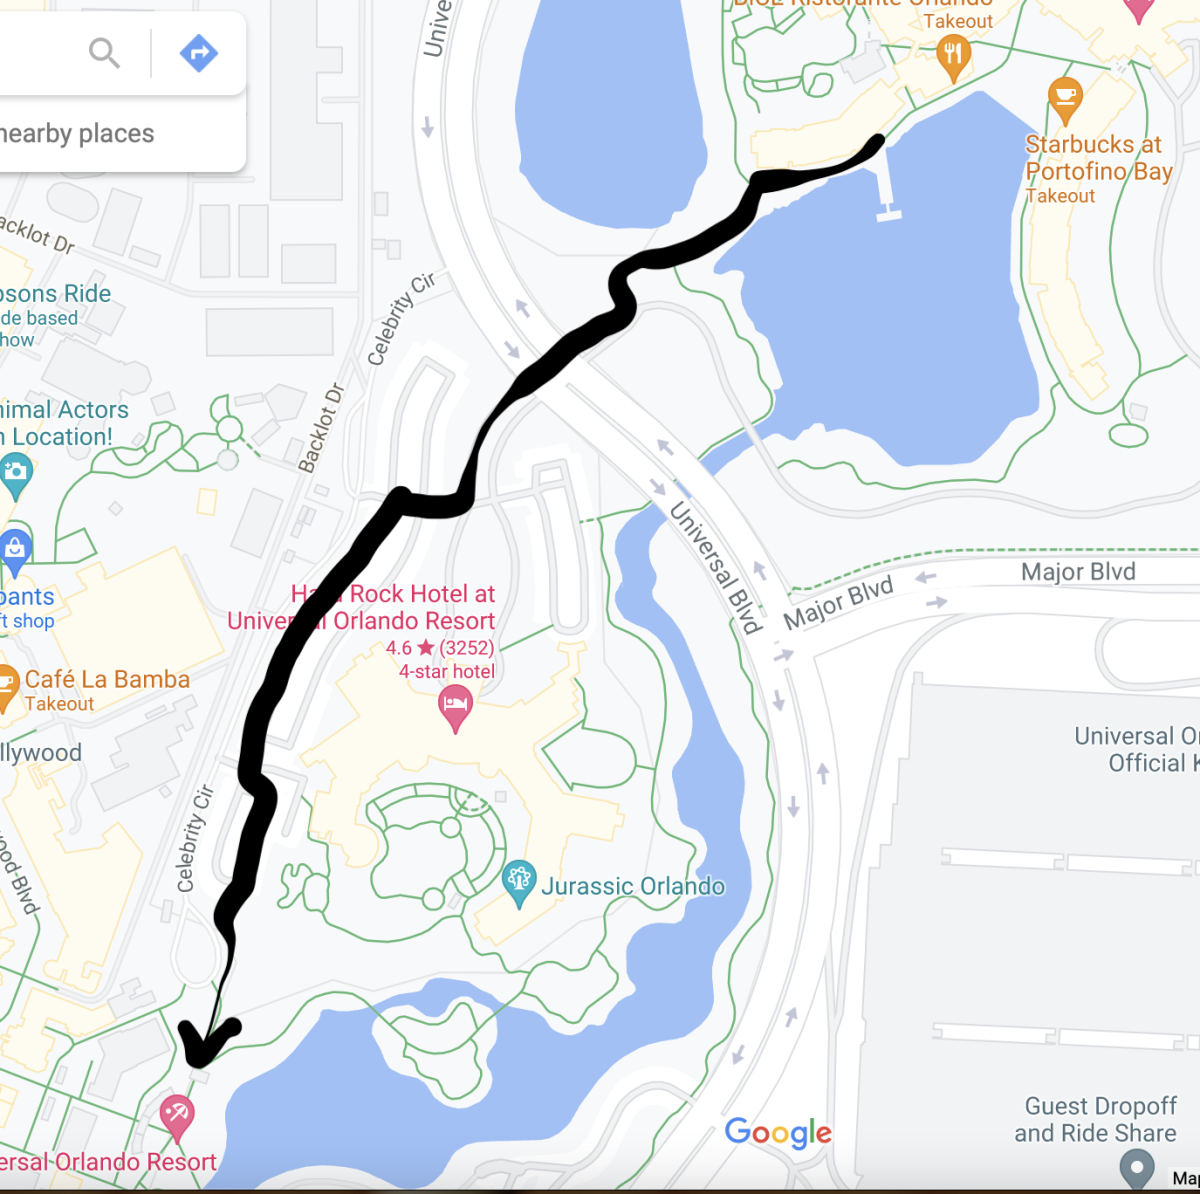 The shortcut from Portofino to Universal Studios